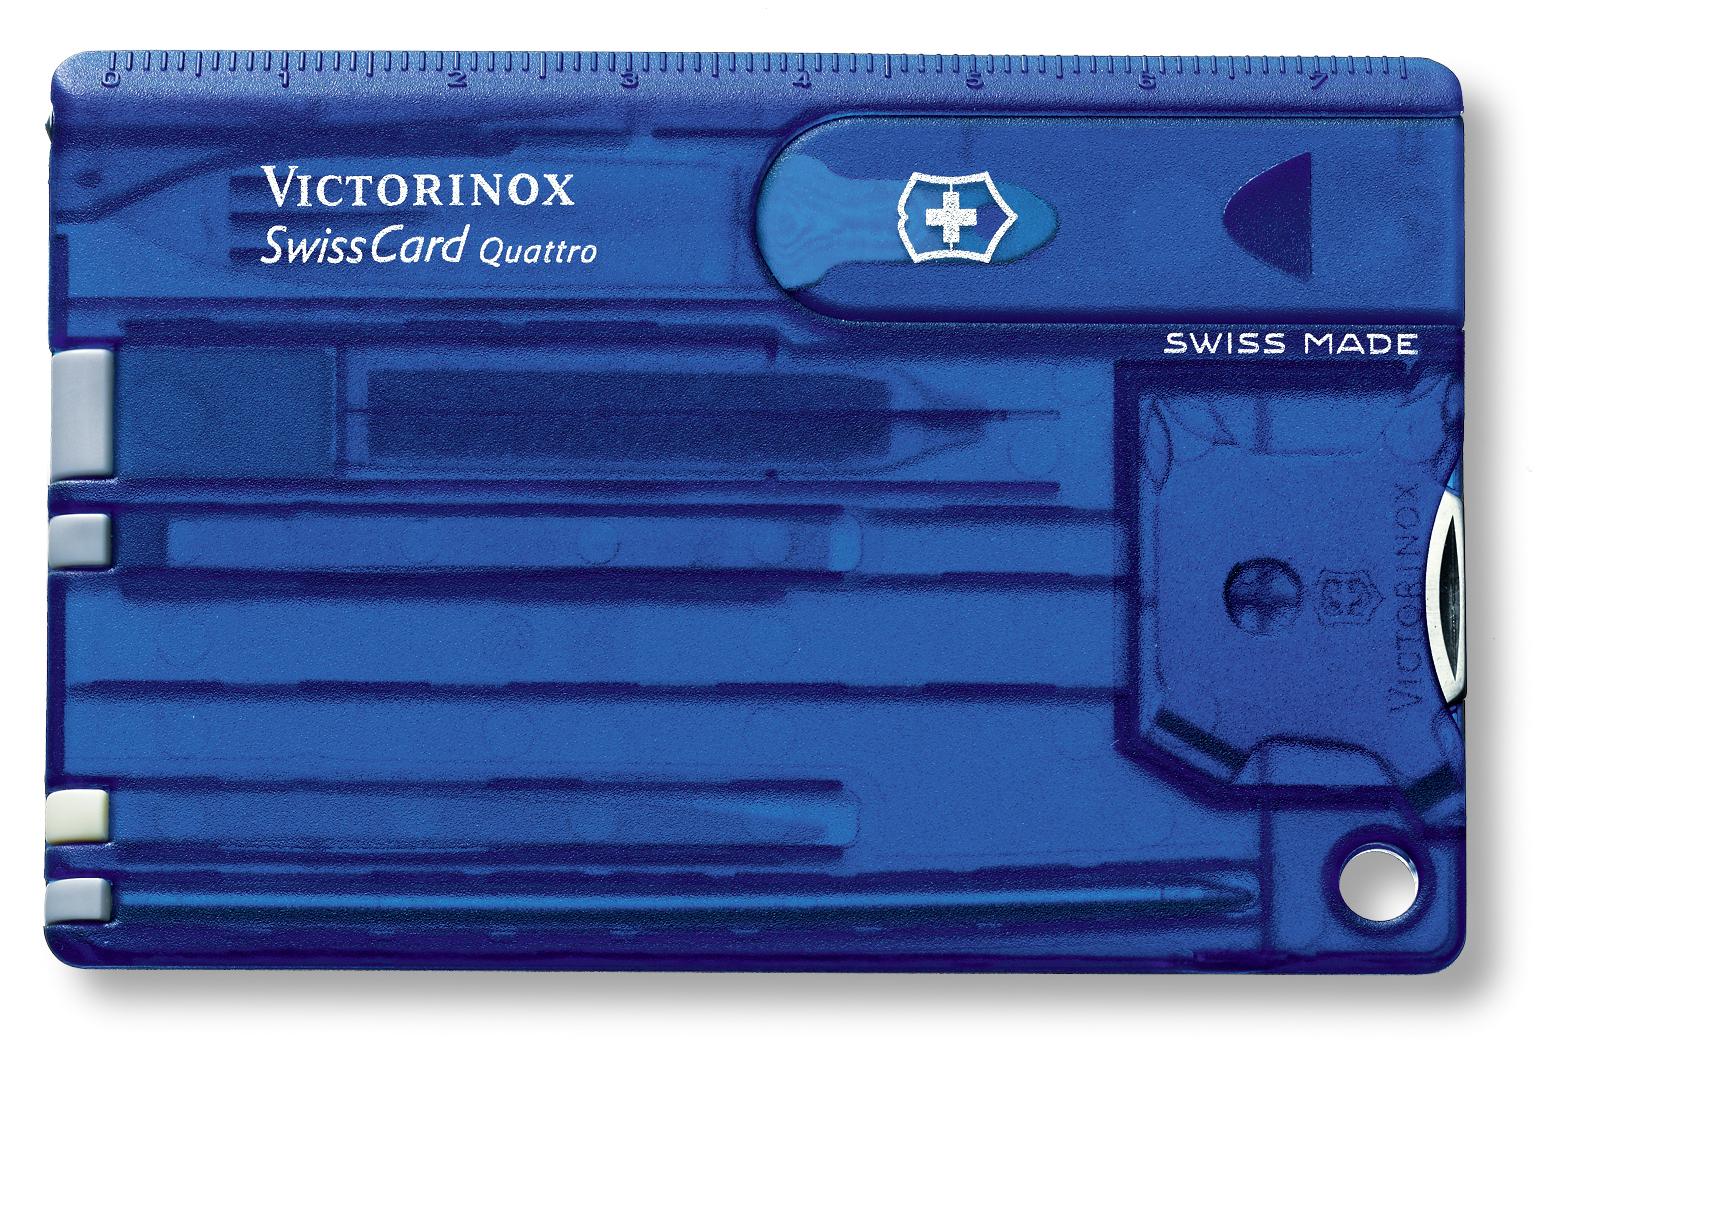 Швейцарская карточка Victorinox SwissCard Quattro, синяя